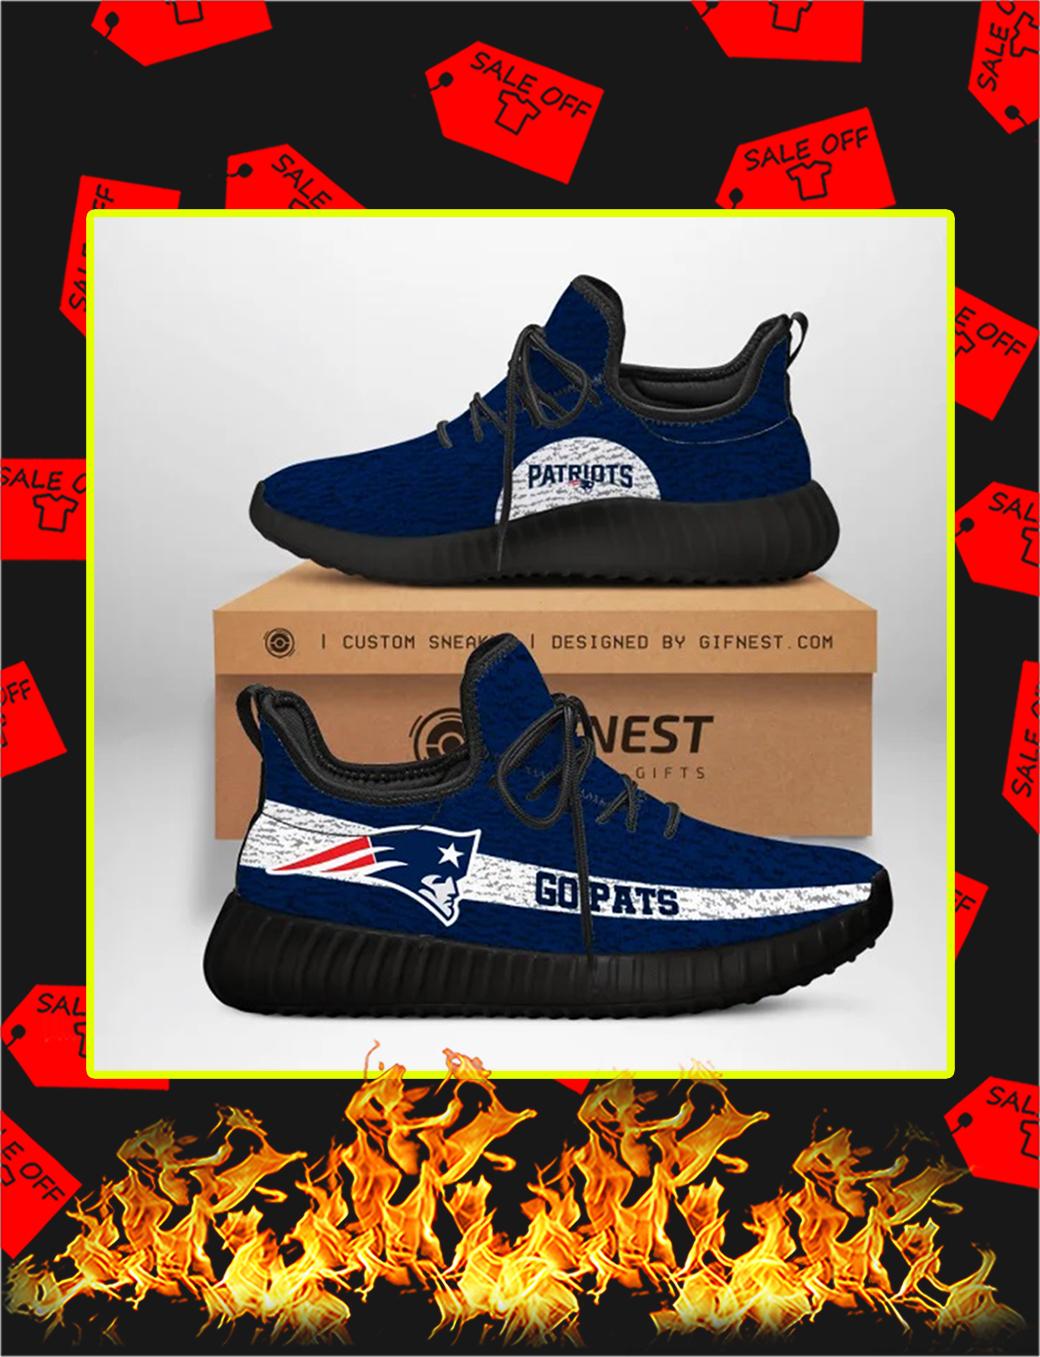 New England Patriots NFL Yeezy Sneaker - black